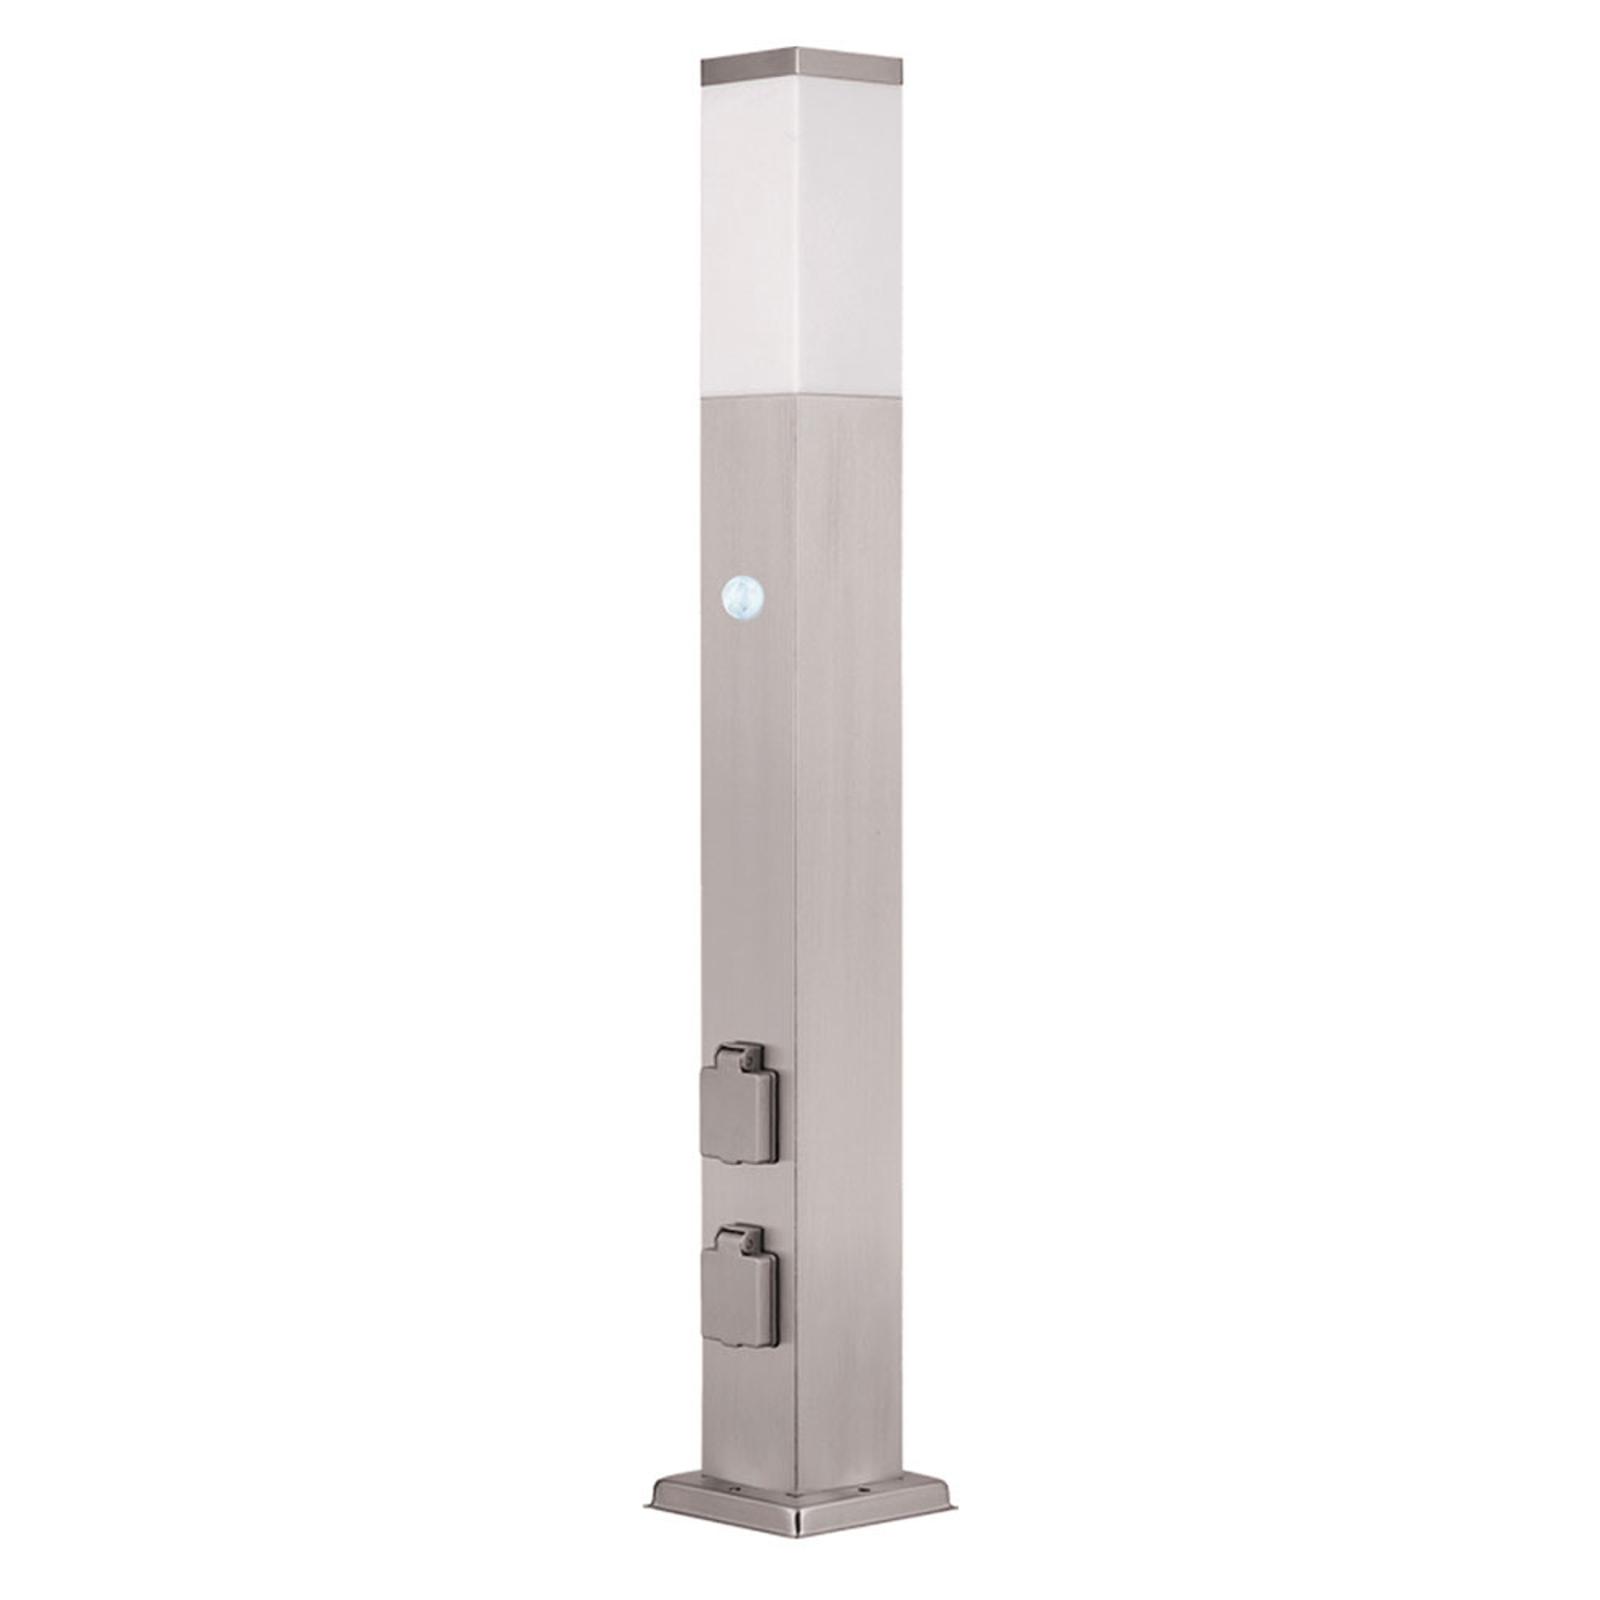 LED-Wegelampe 400166, 2 Steckdosen Bewegungsmelder